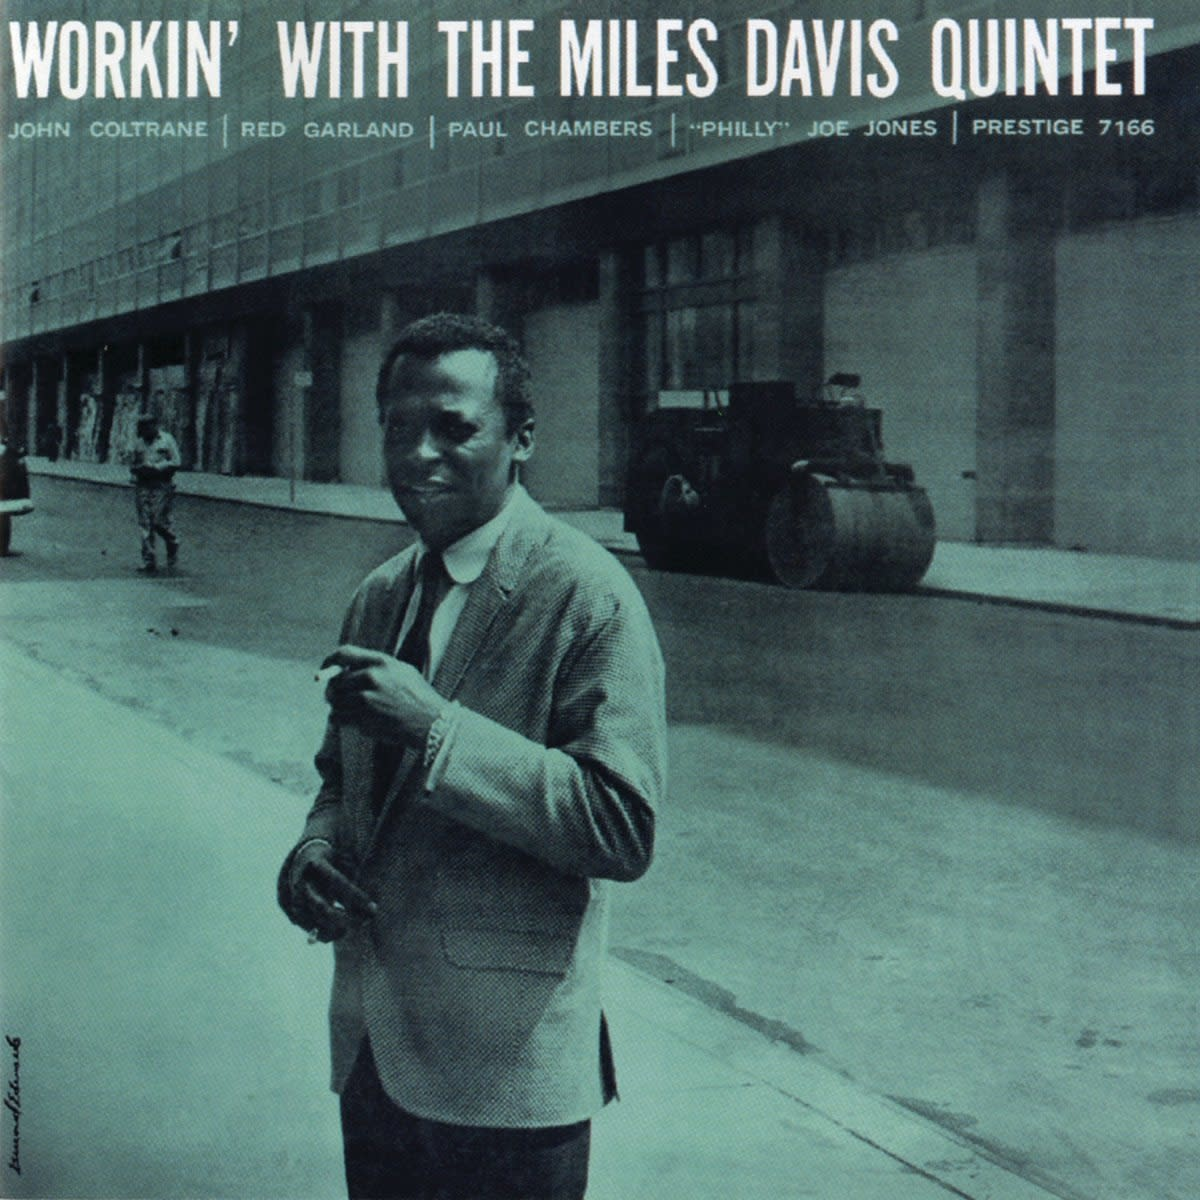 The Miles Davis Quintet • Workin' With The Miles Davis Quintet-1